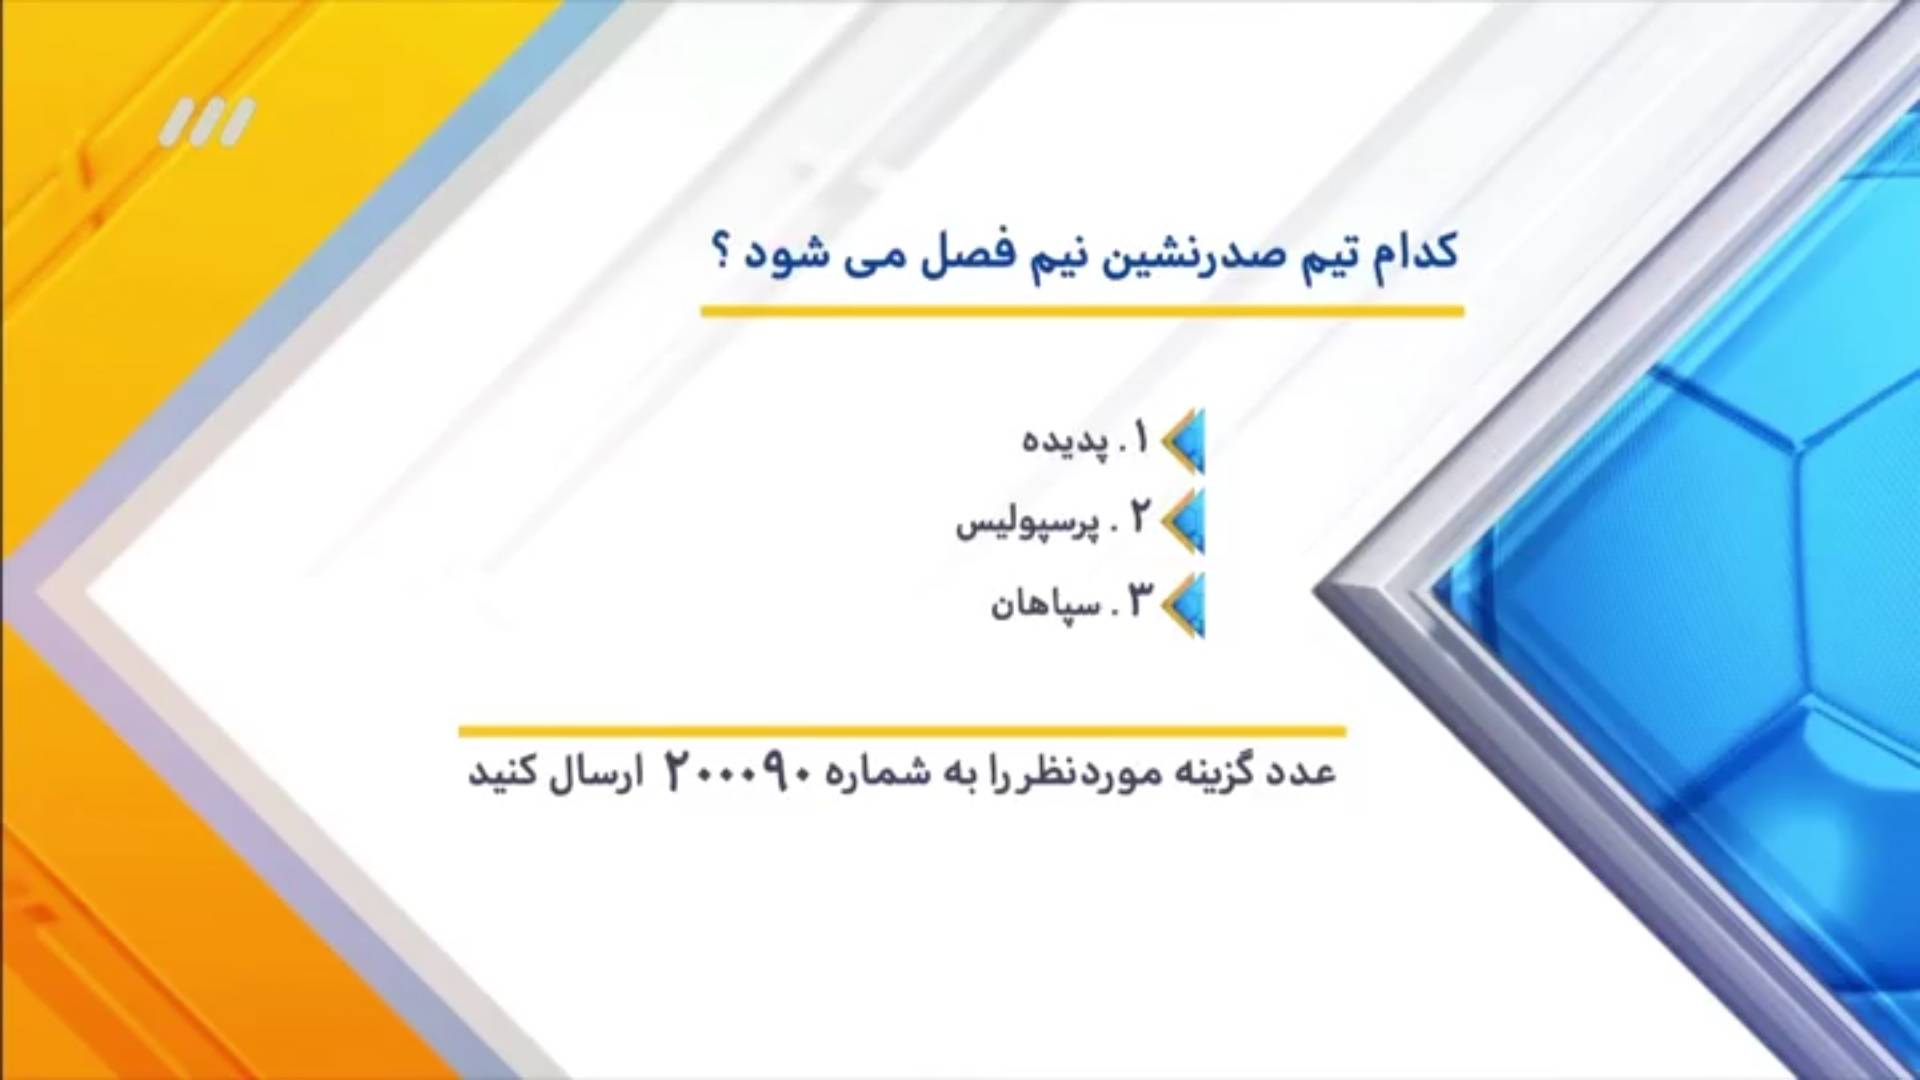 عادل فردوسیپور,اخبار فوتبال,خبرهای فوتبال,حواشی فوتبال